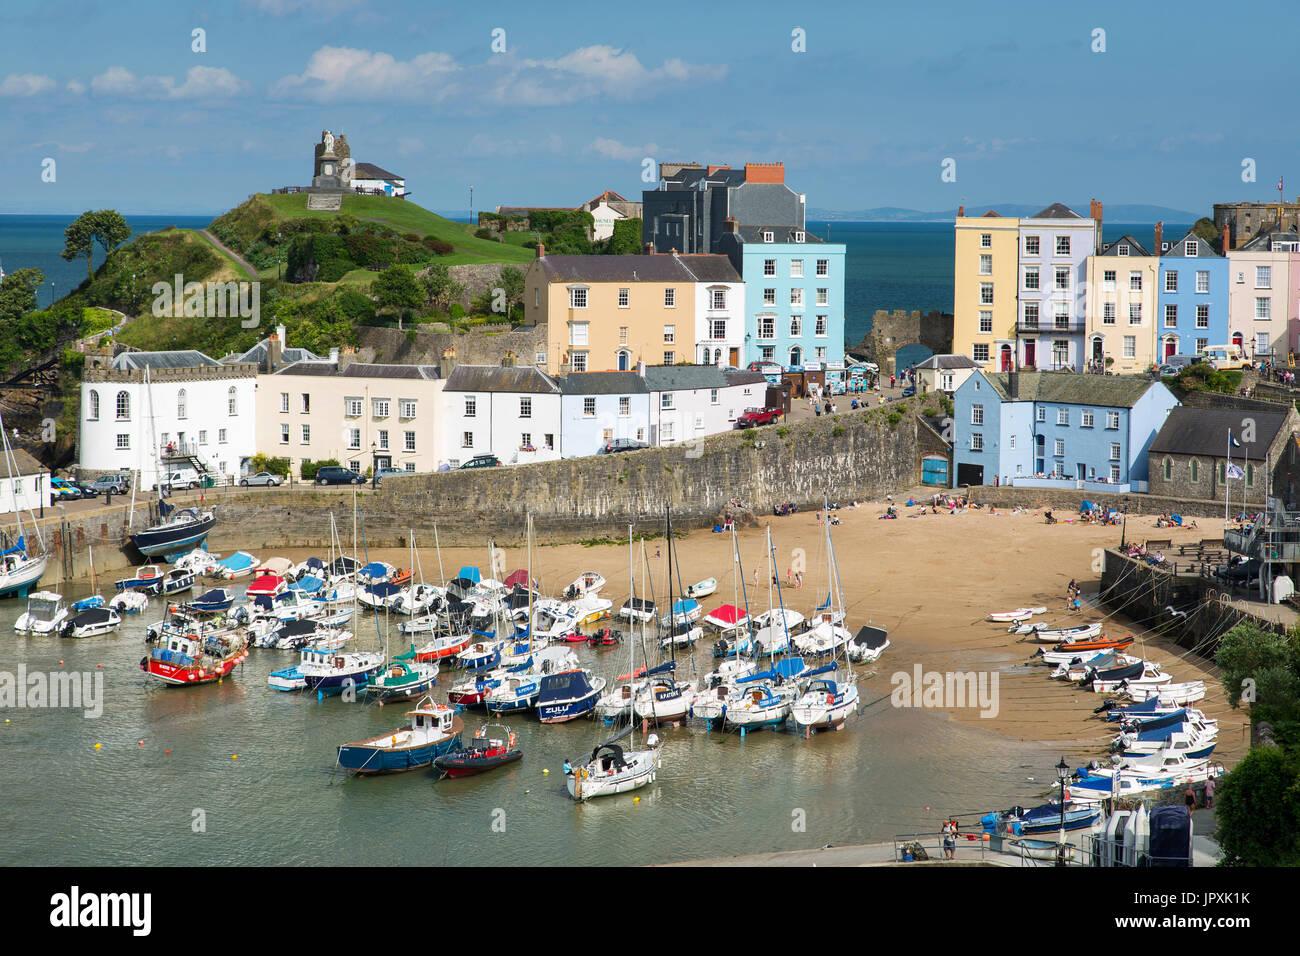 Tenby Harbour, Pembrokeshire, Wales, UK - Stock Image